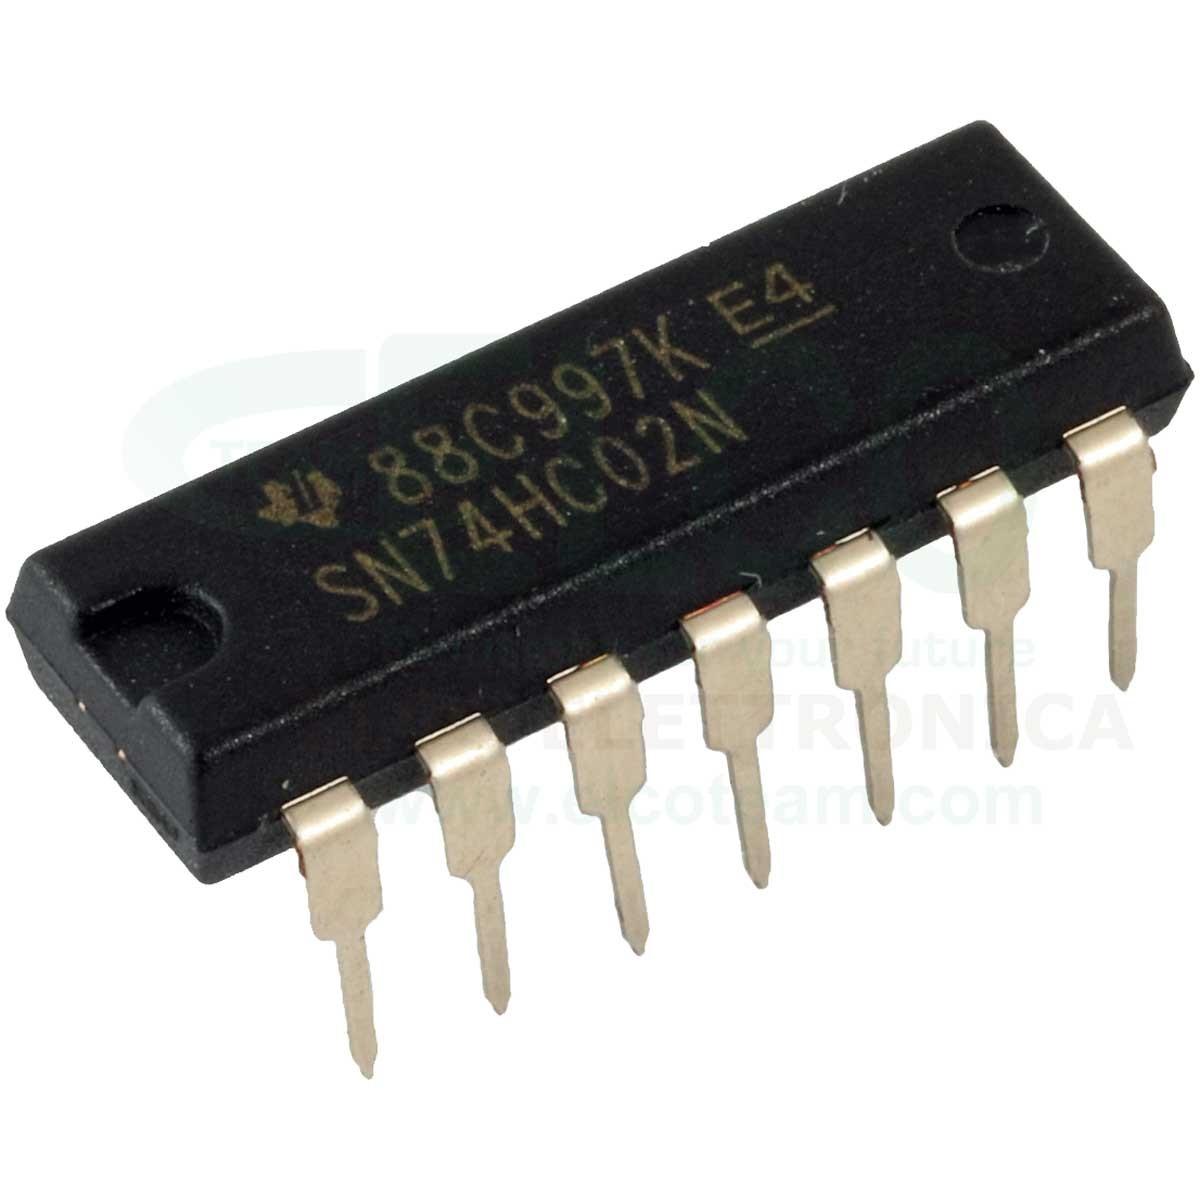 Sn74ls00n circuito integrato dip-14